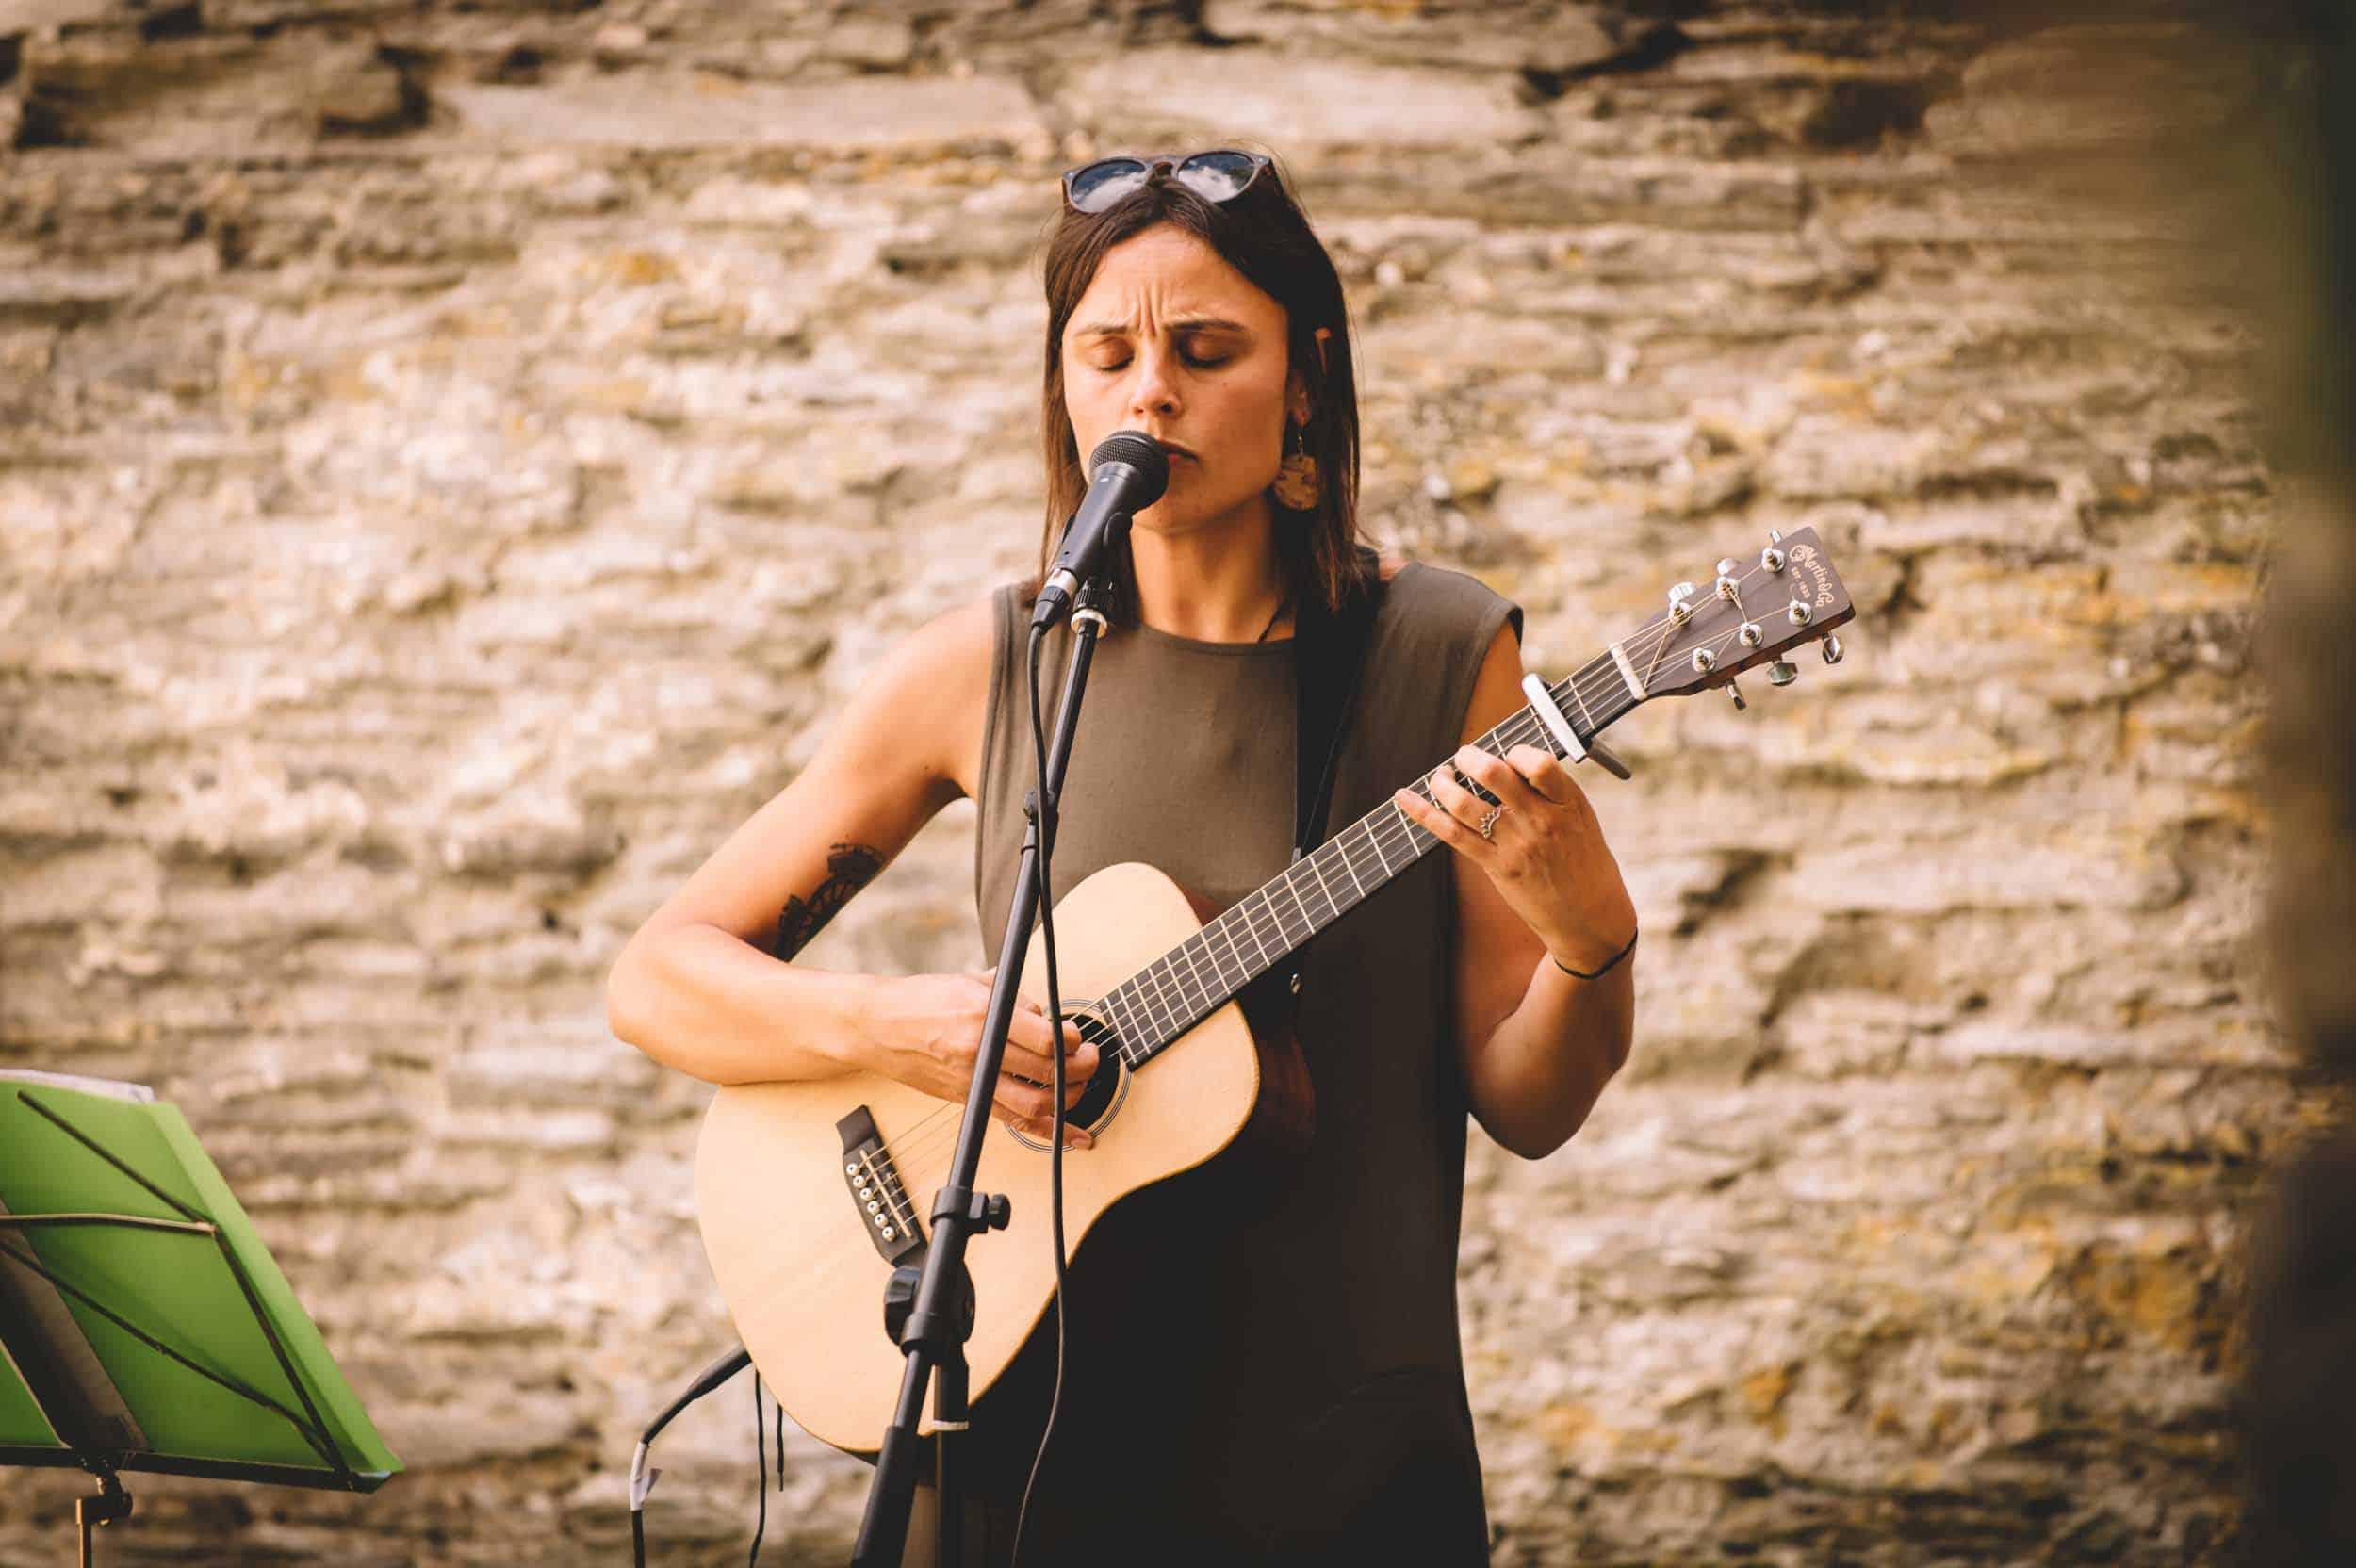 Nick & Nina's Thurlby Domain Elopement Jade Howe Music Wanaka Wedding Singer